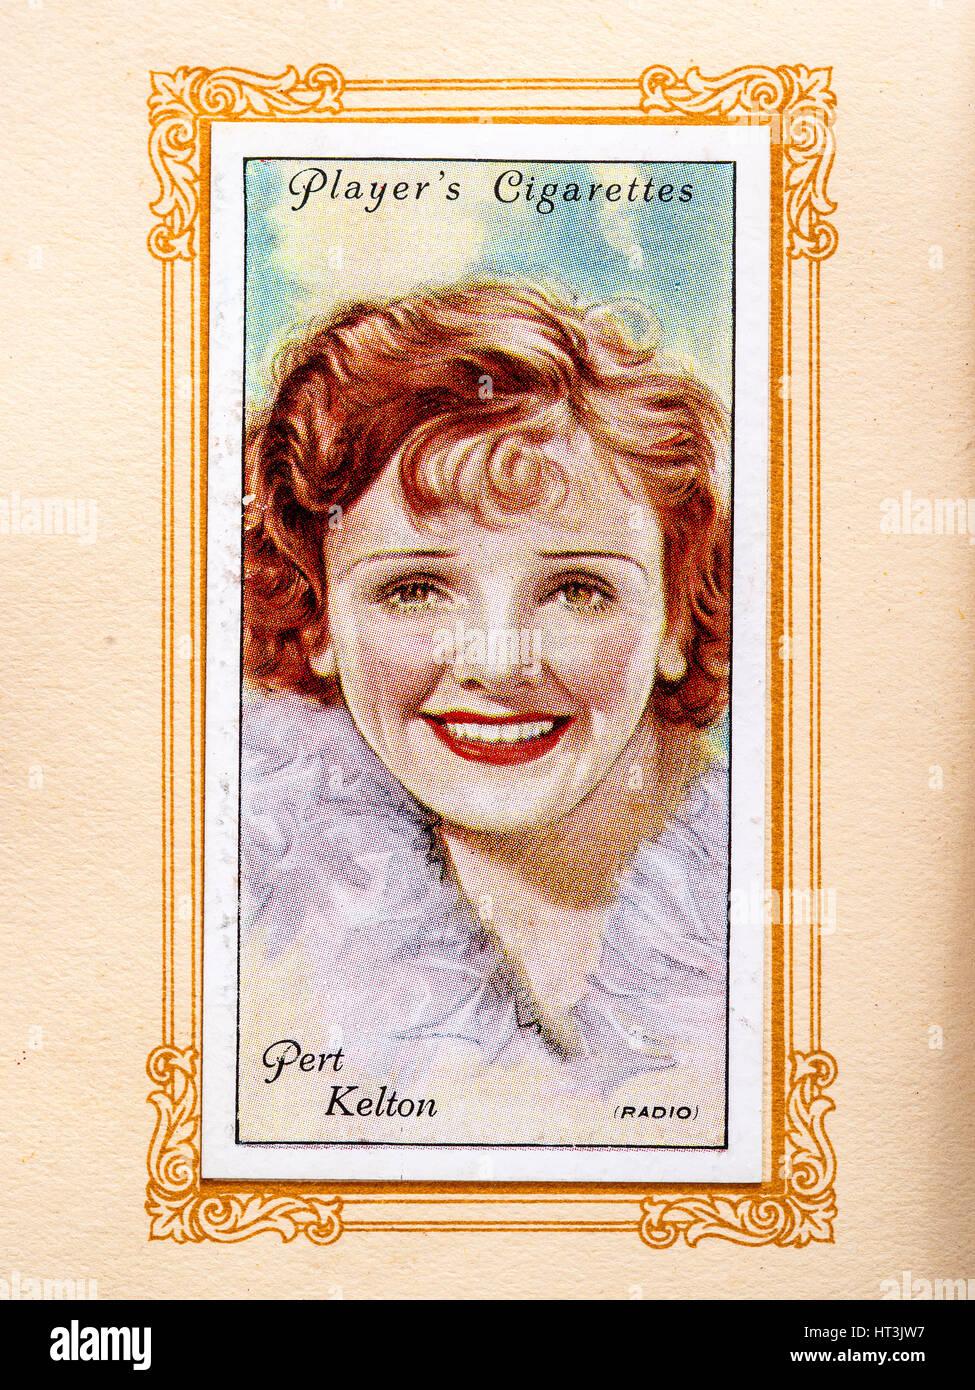 Pert Kelton, 1934. Pert Kelton (October 14, 1907[1] - October 29, 1968) was an American vaudeville, movie, radio - Stock Image